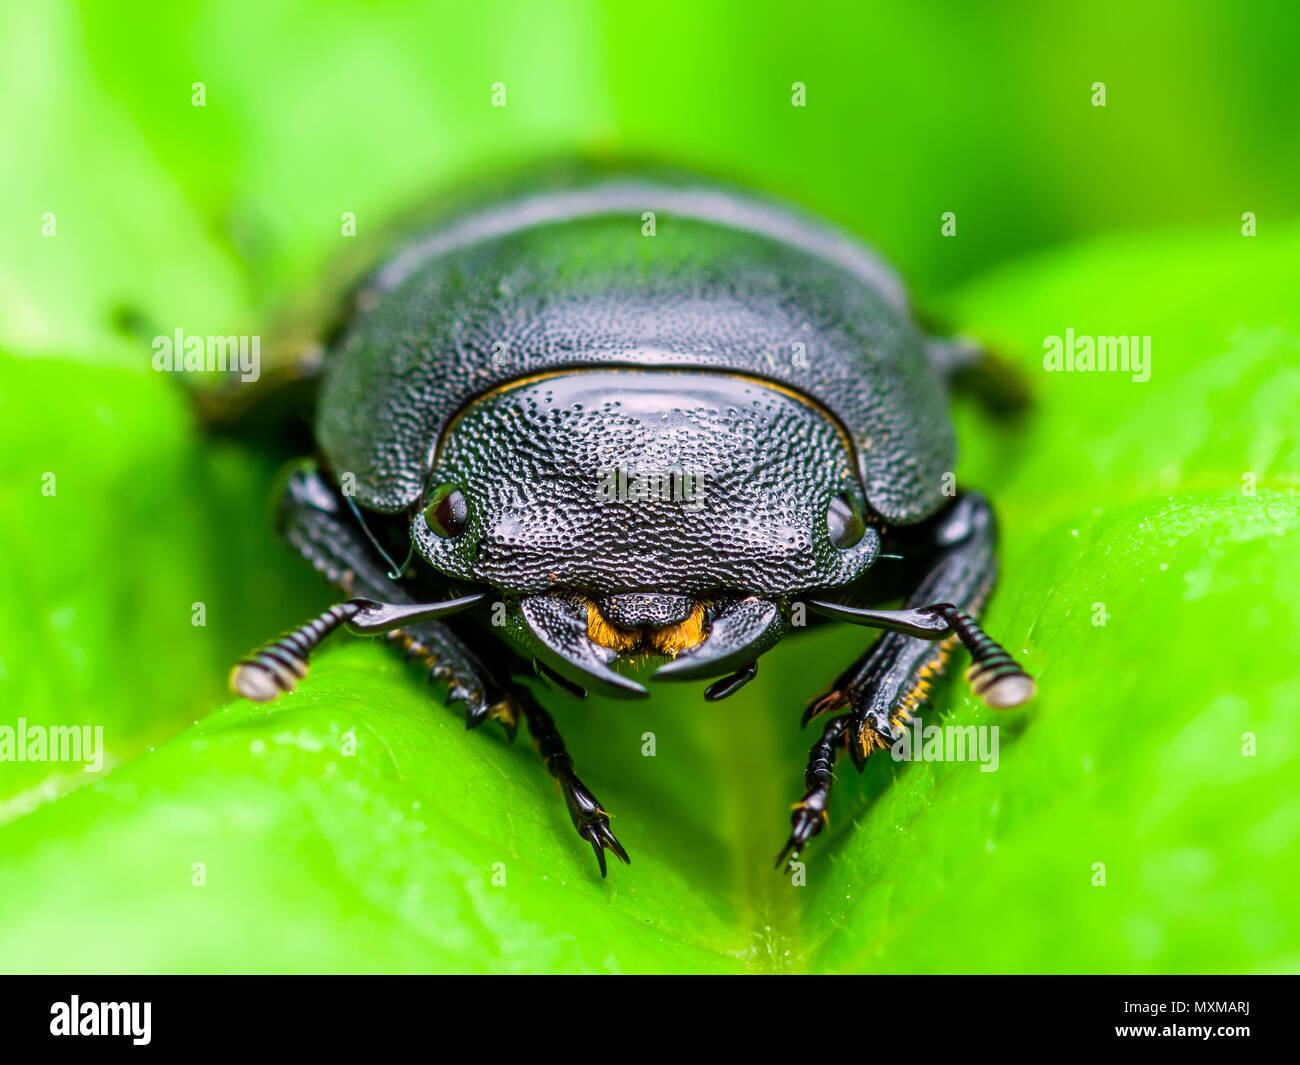 Dunkle käfer insekt auf grünes Blatt Hintergrund Stockbild